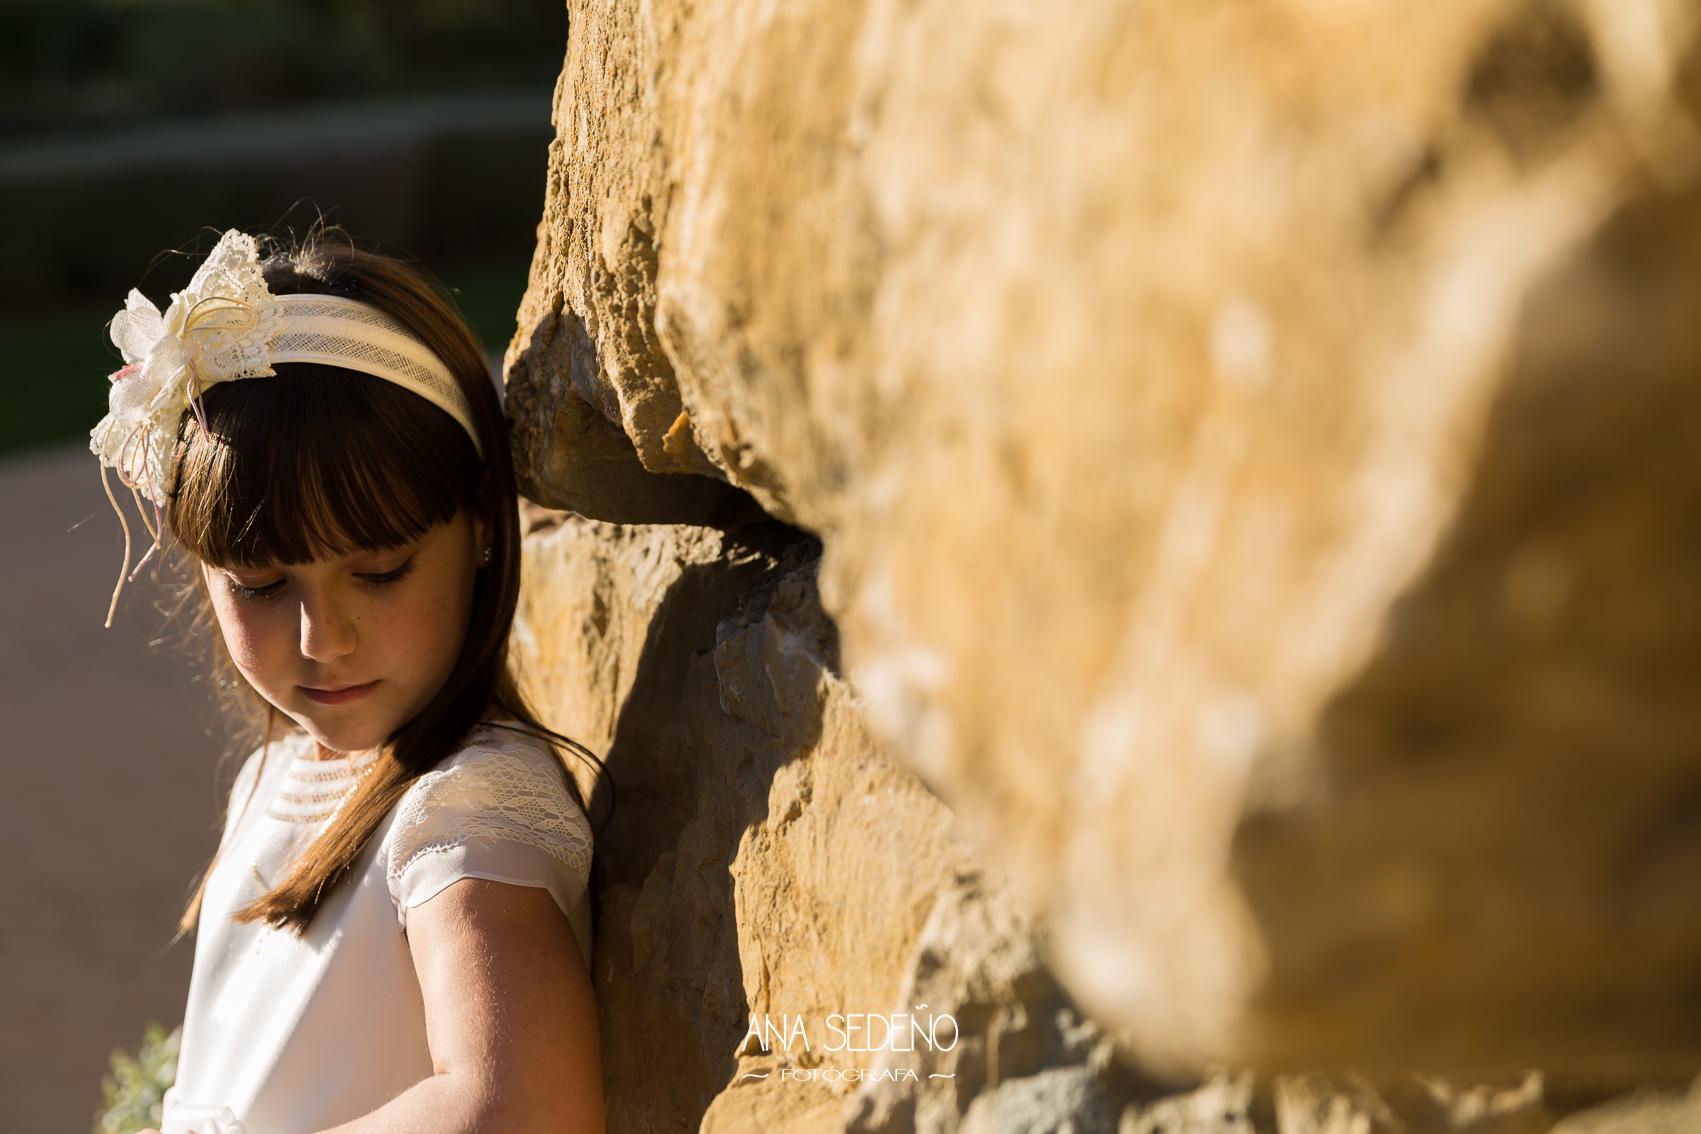 Ana Sedeño Fotografa.-Alejandra-0141